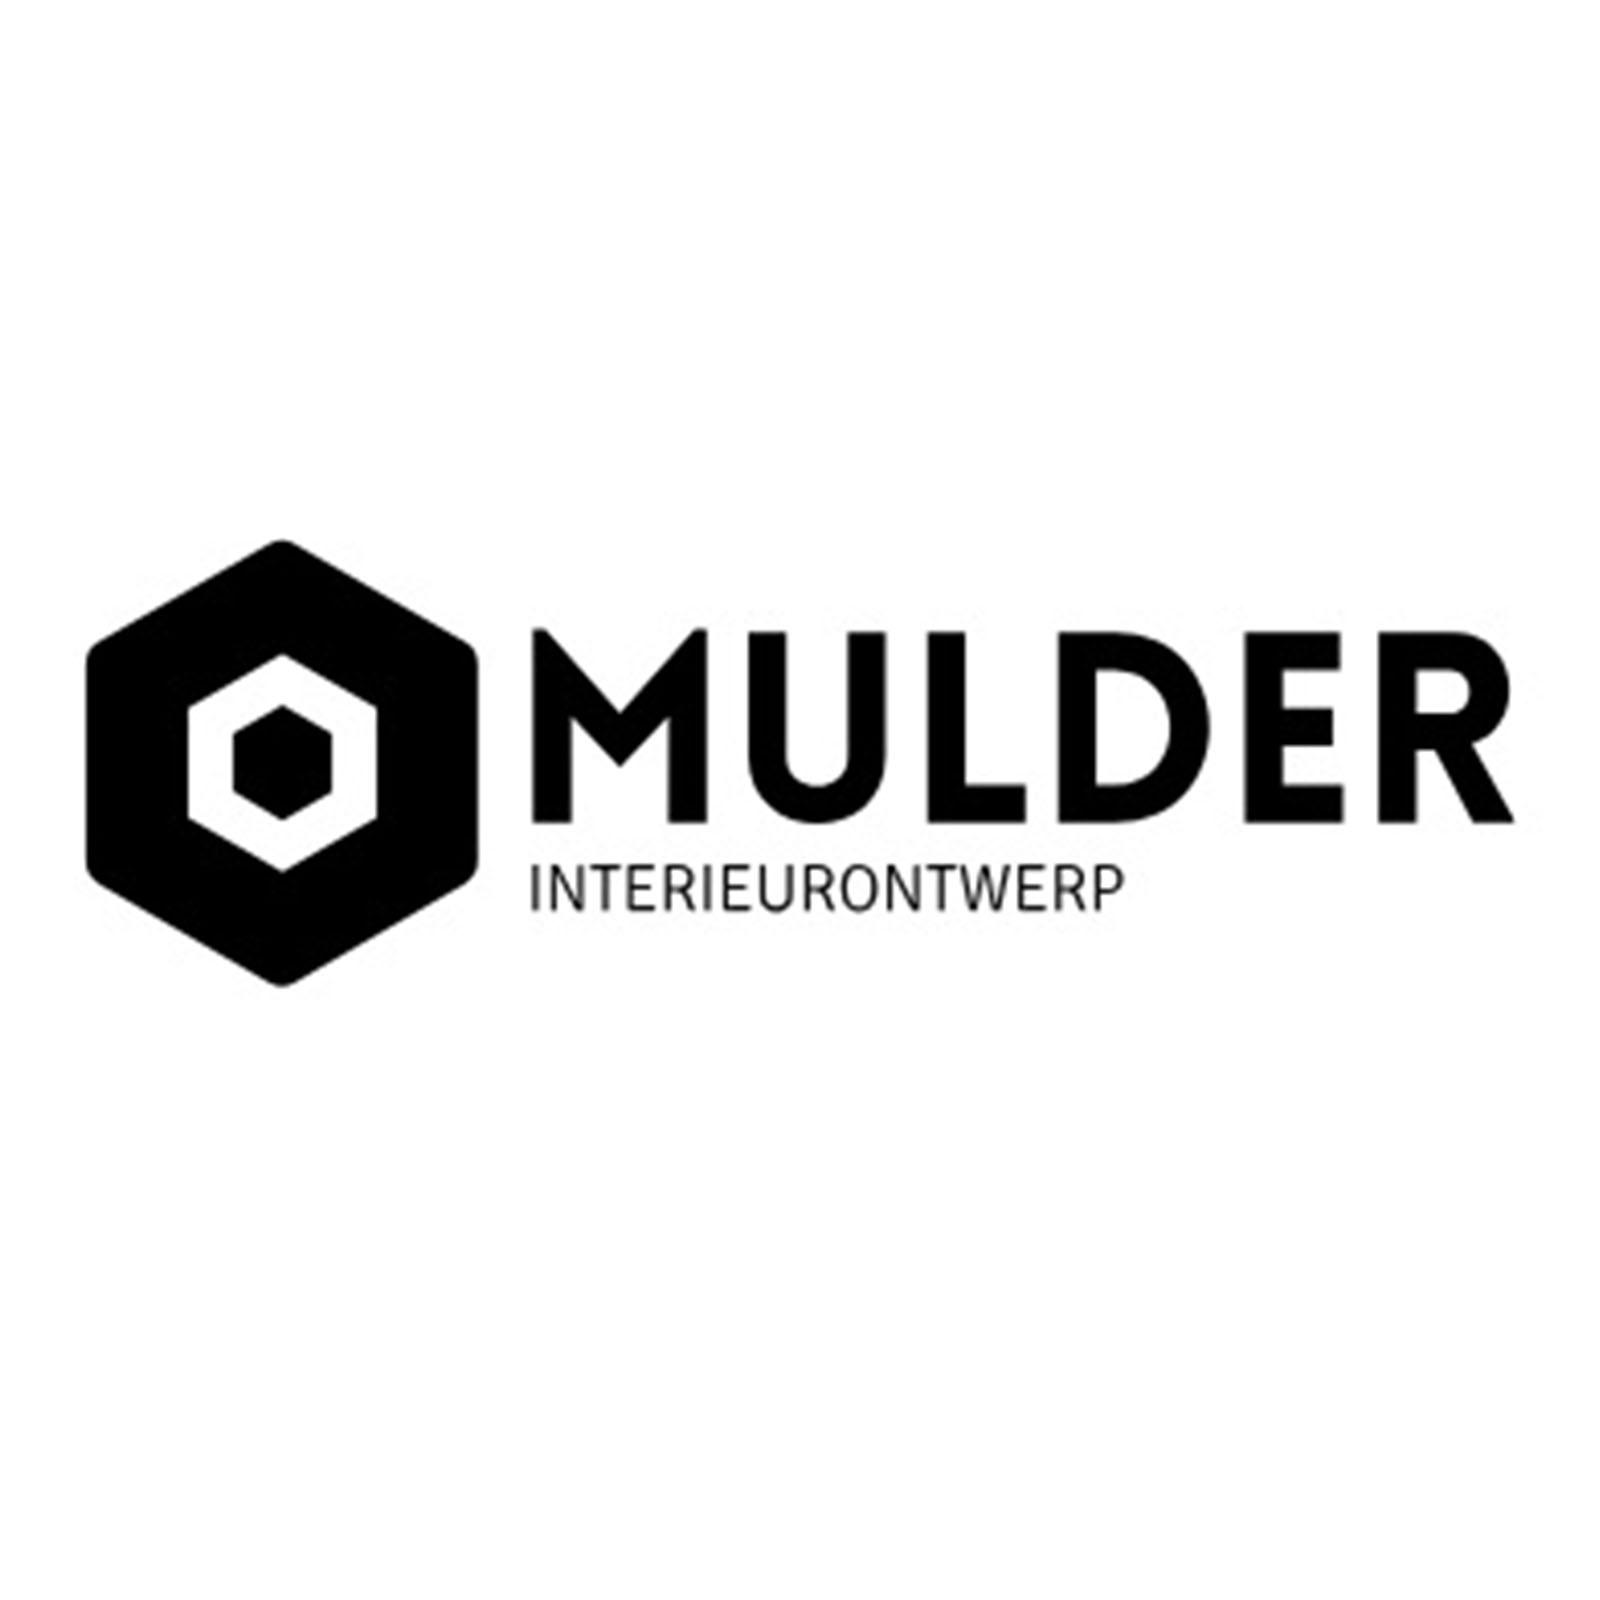 Mulder Interieurontwerp